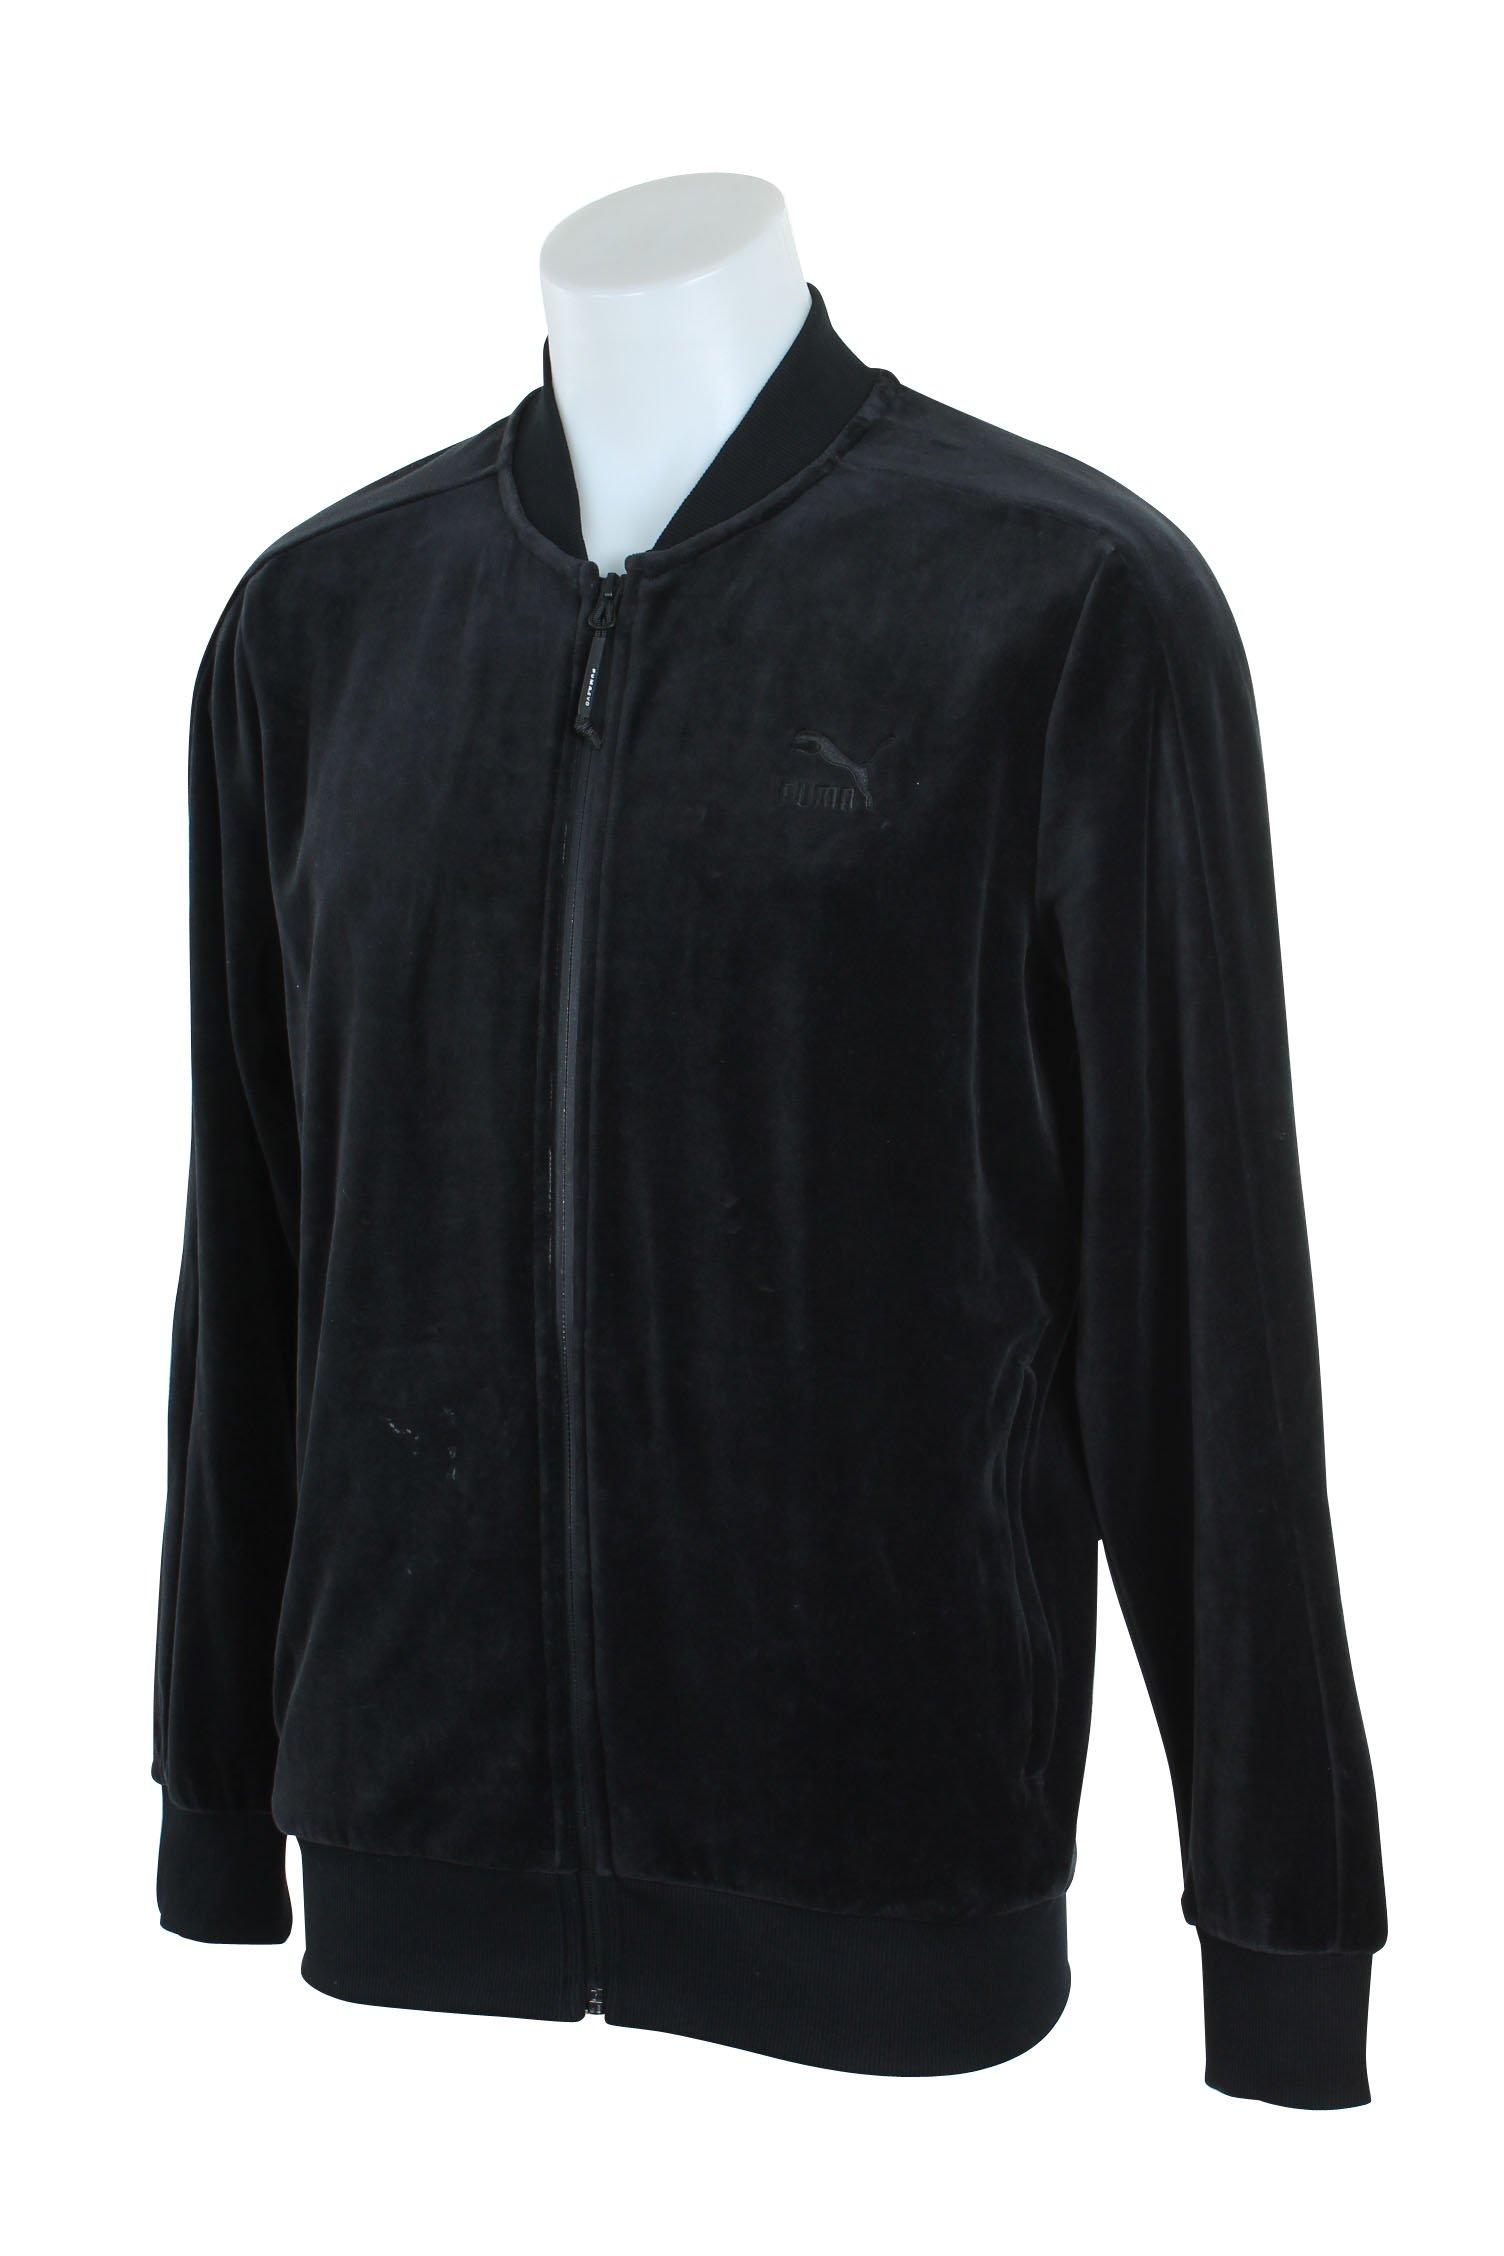 PUMA Men's Velour T7 Jacket, Black, 4XL